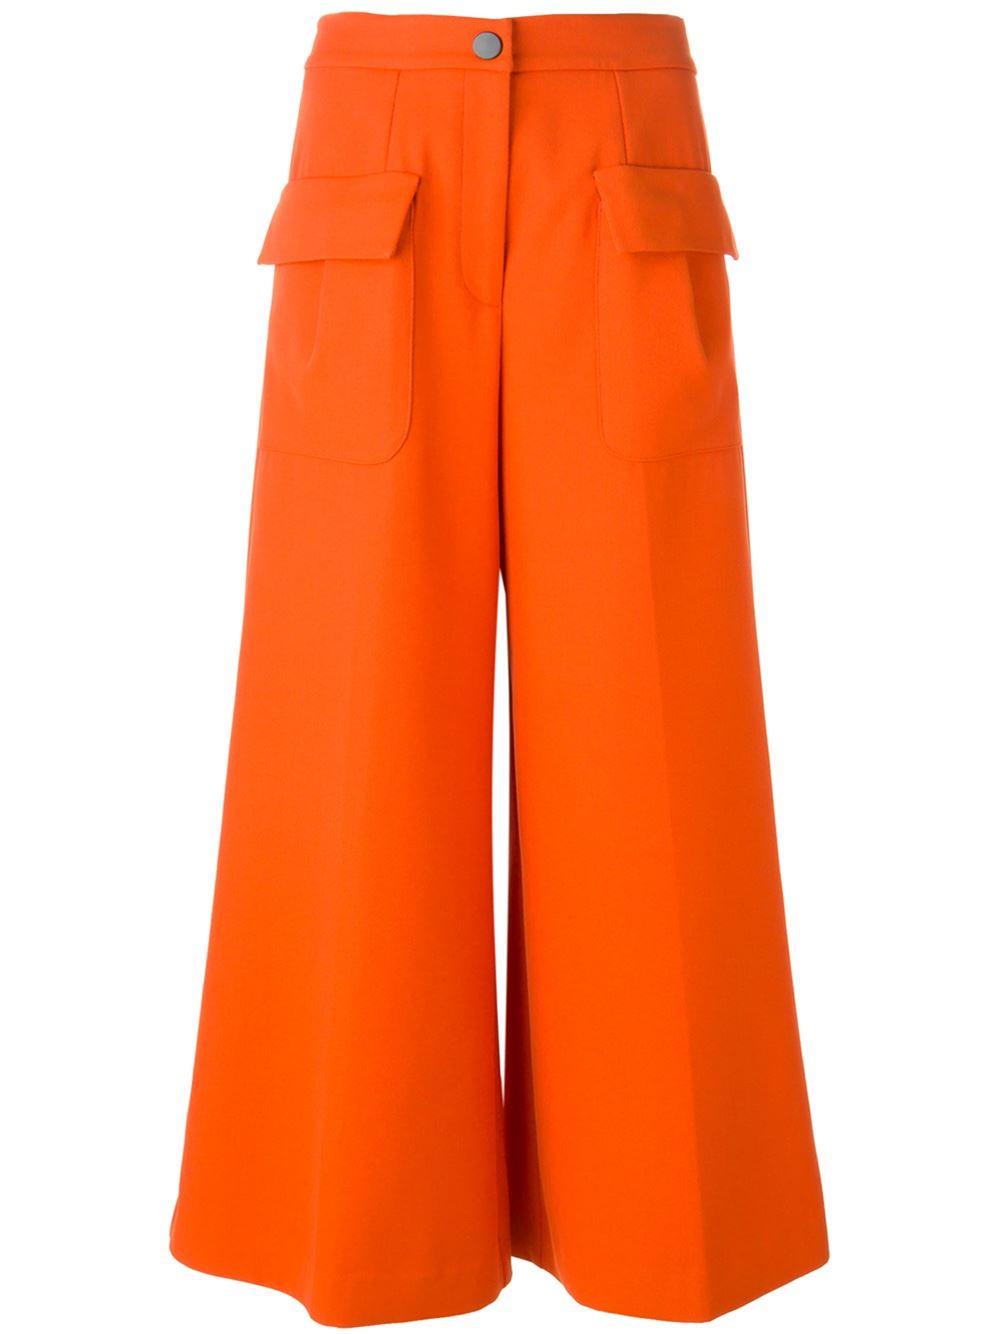 Orange stretch cotton blend wide leg trousers from Giulietta New York